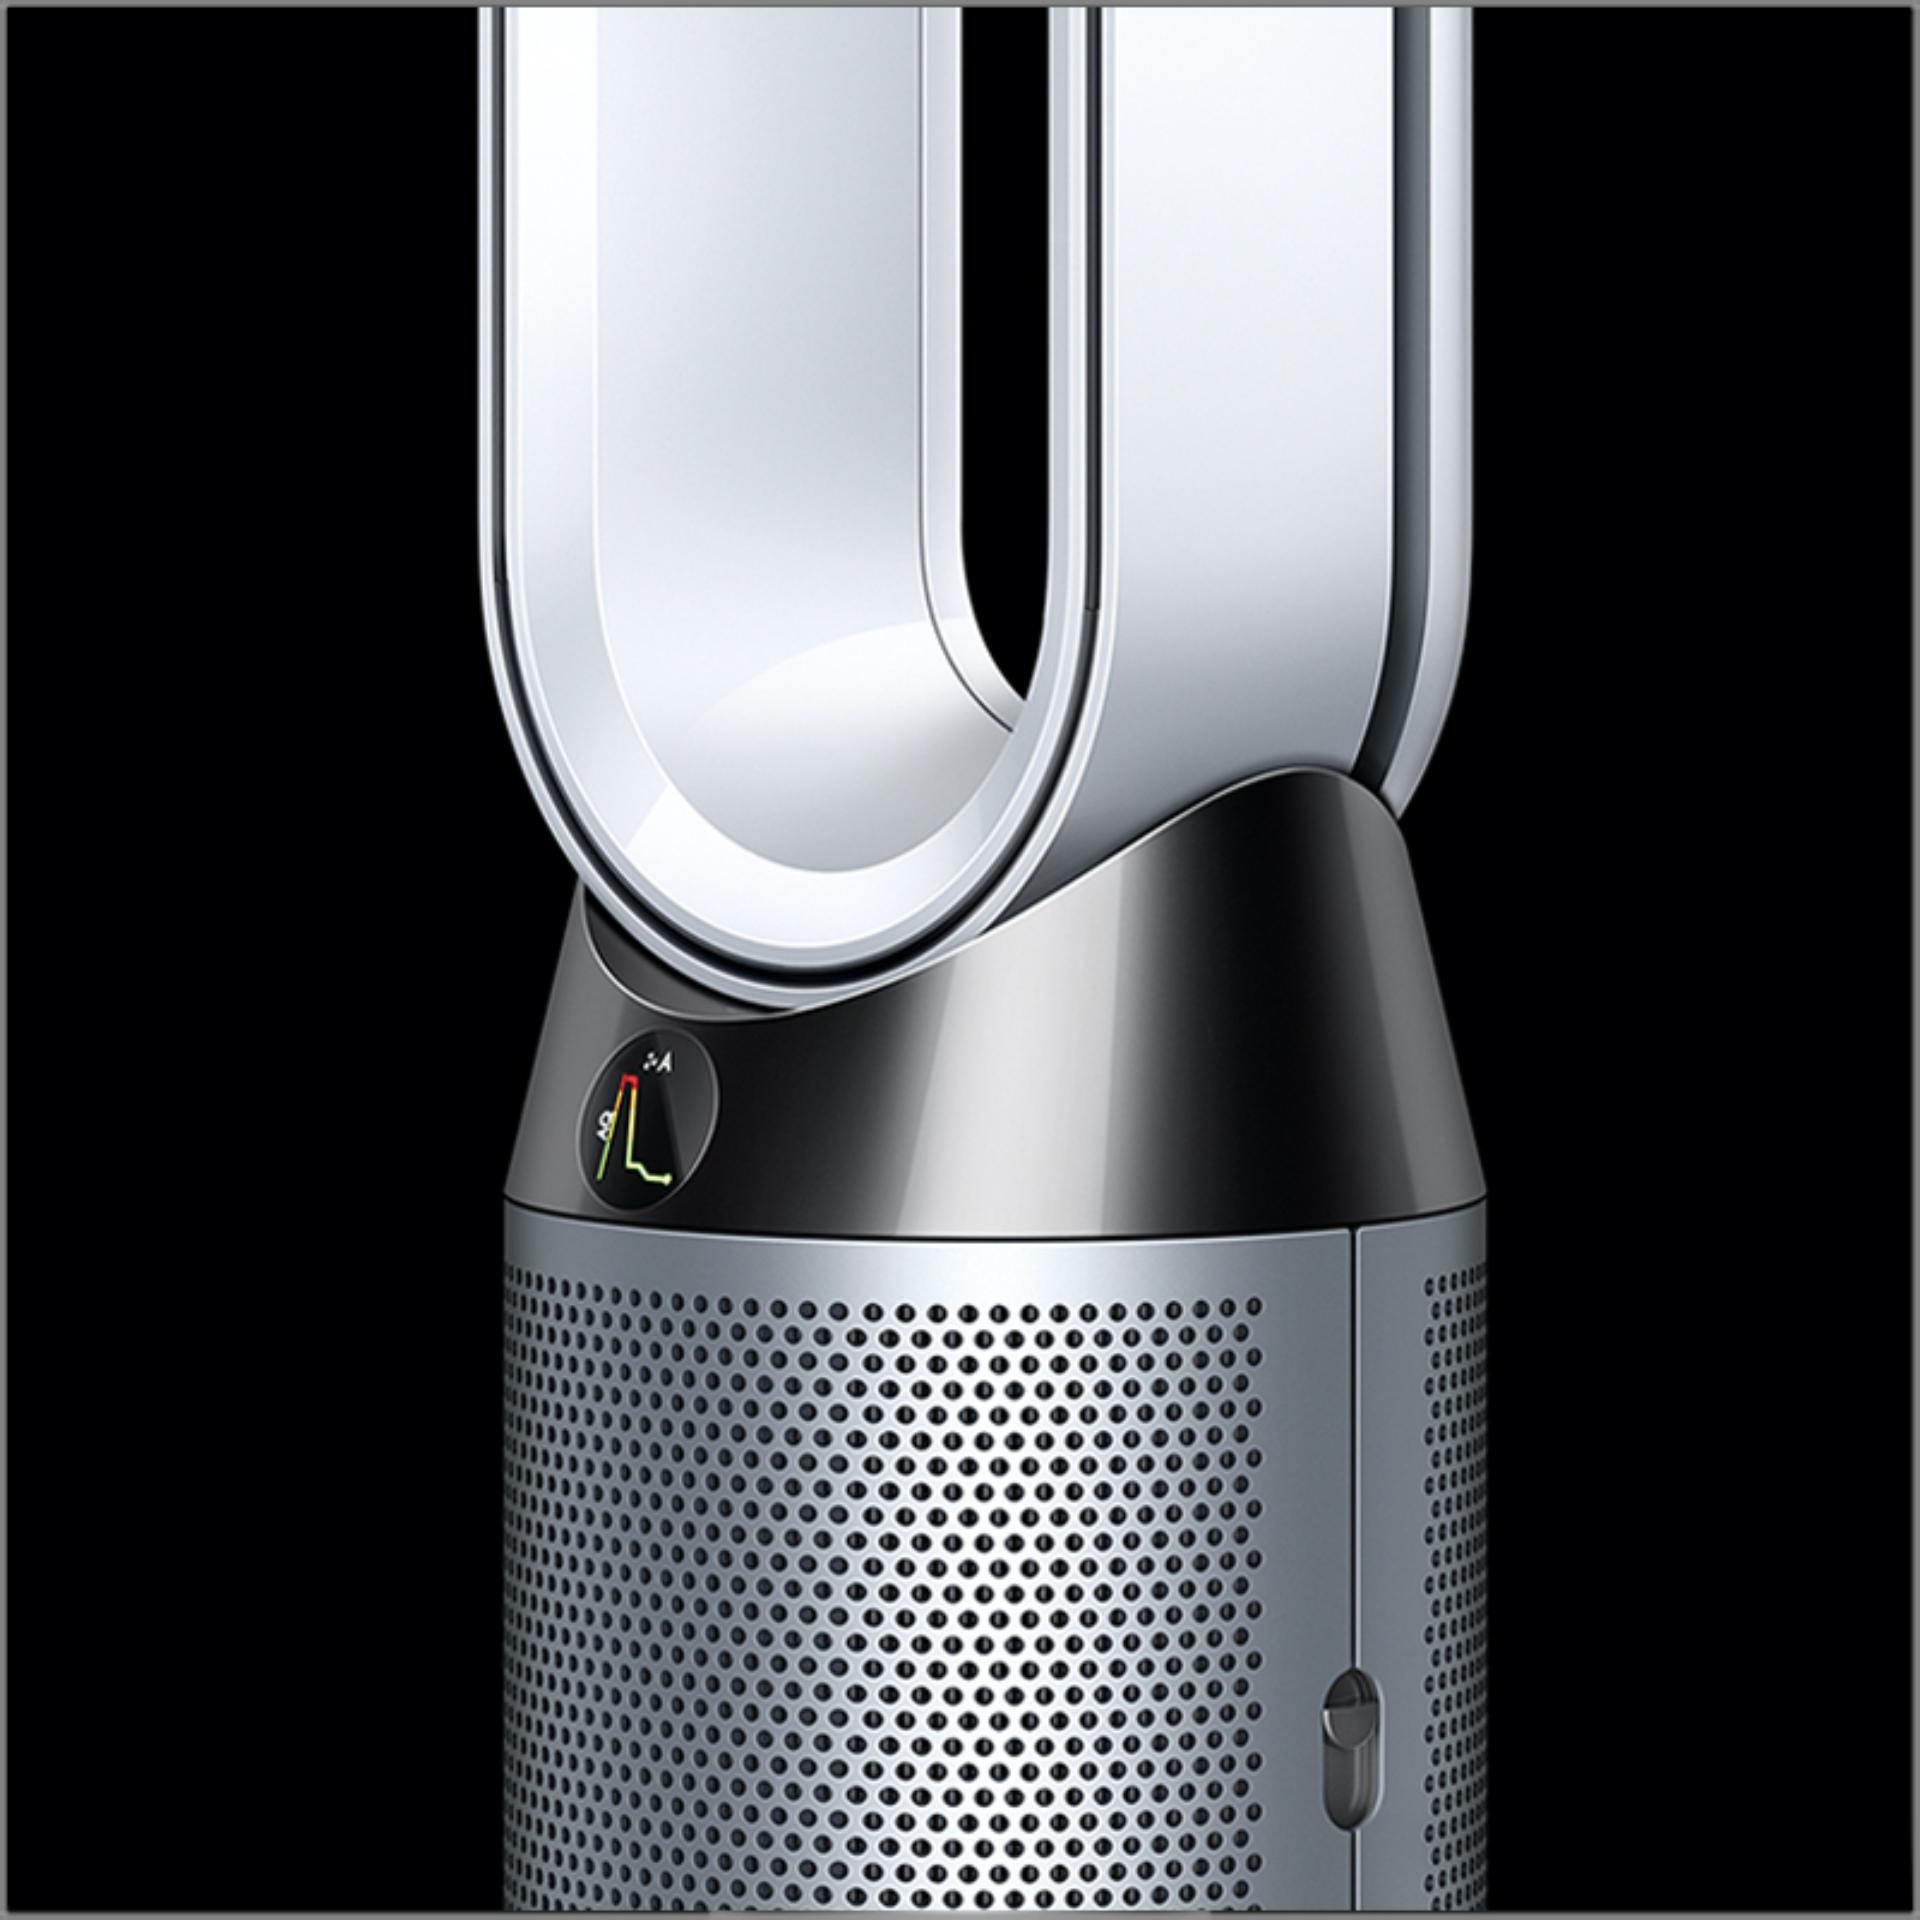 Dyson Pure Hot+Cool™ Advanced Technology (White/Silver)Purifier